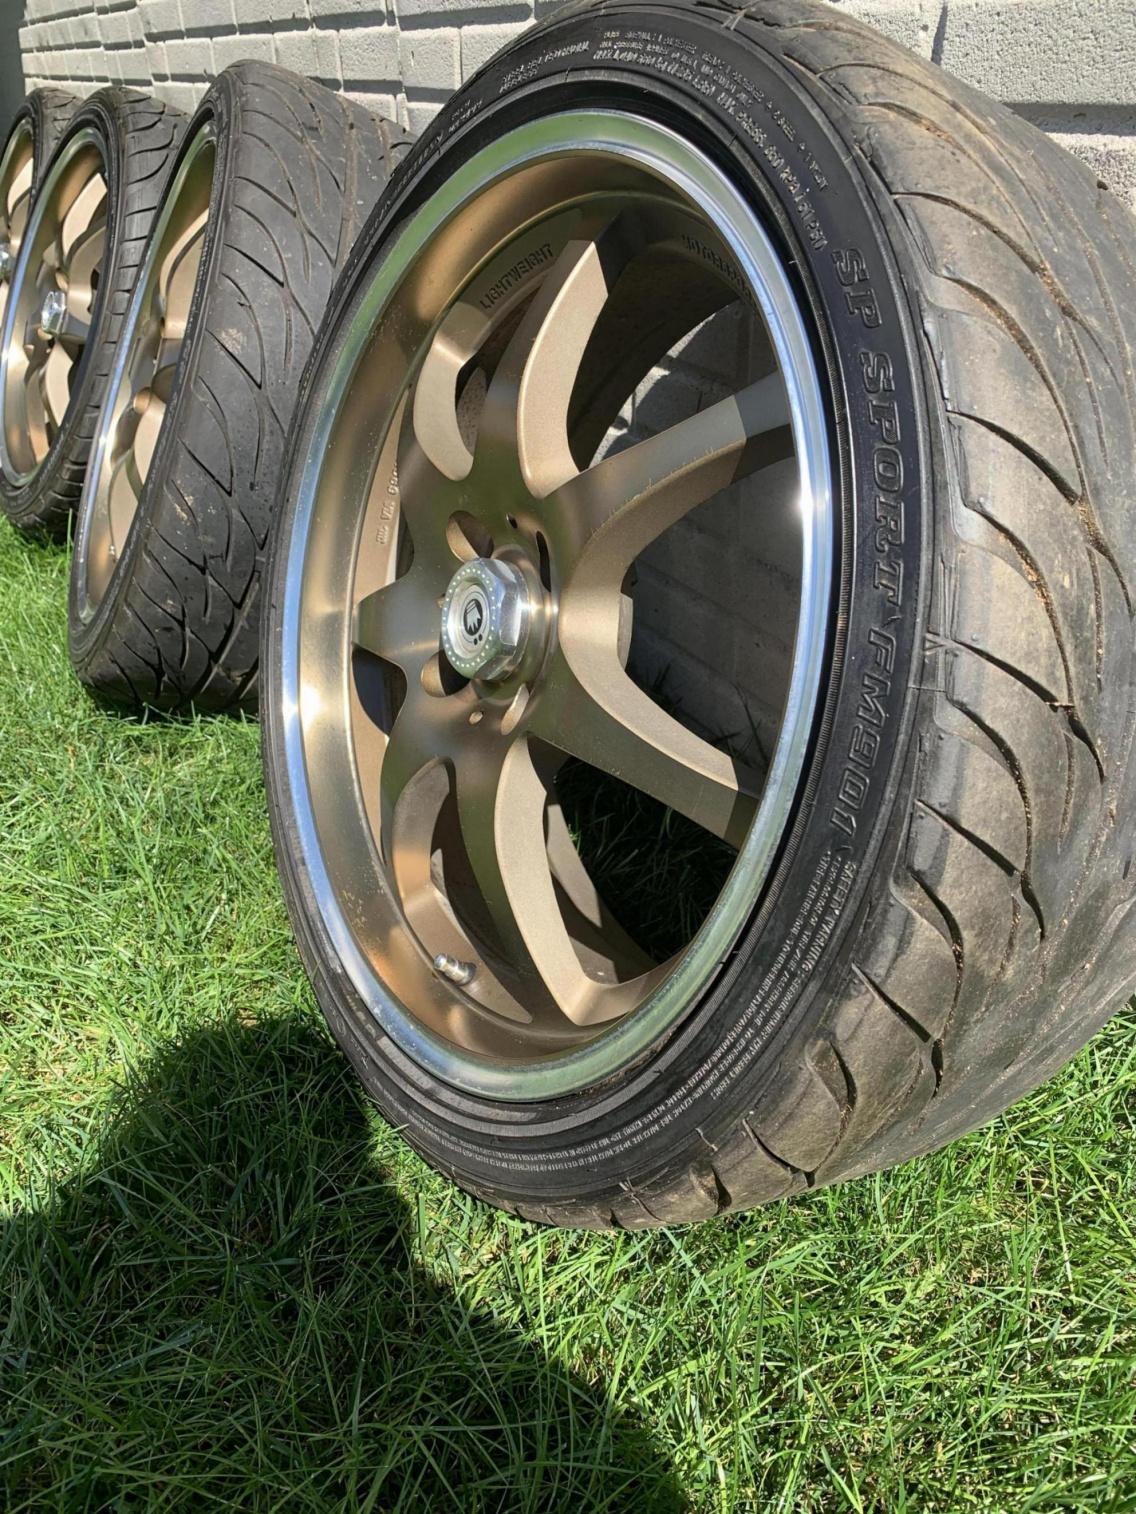 18 inch konig next copper wheels-4c45f863-70af-4e46-b624-8764d23d6d26_1560283779009.jpg